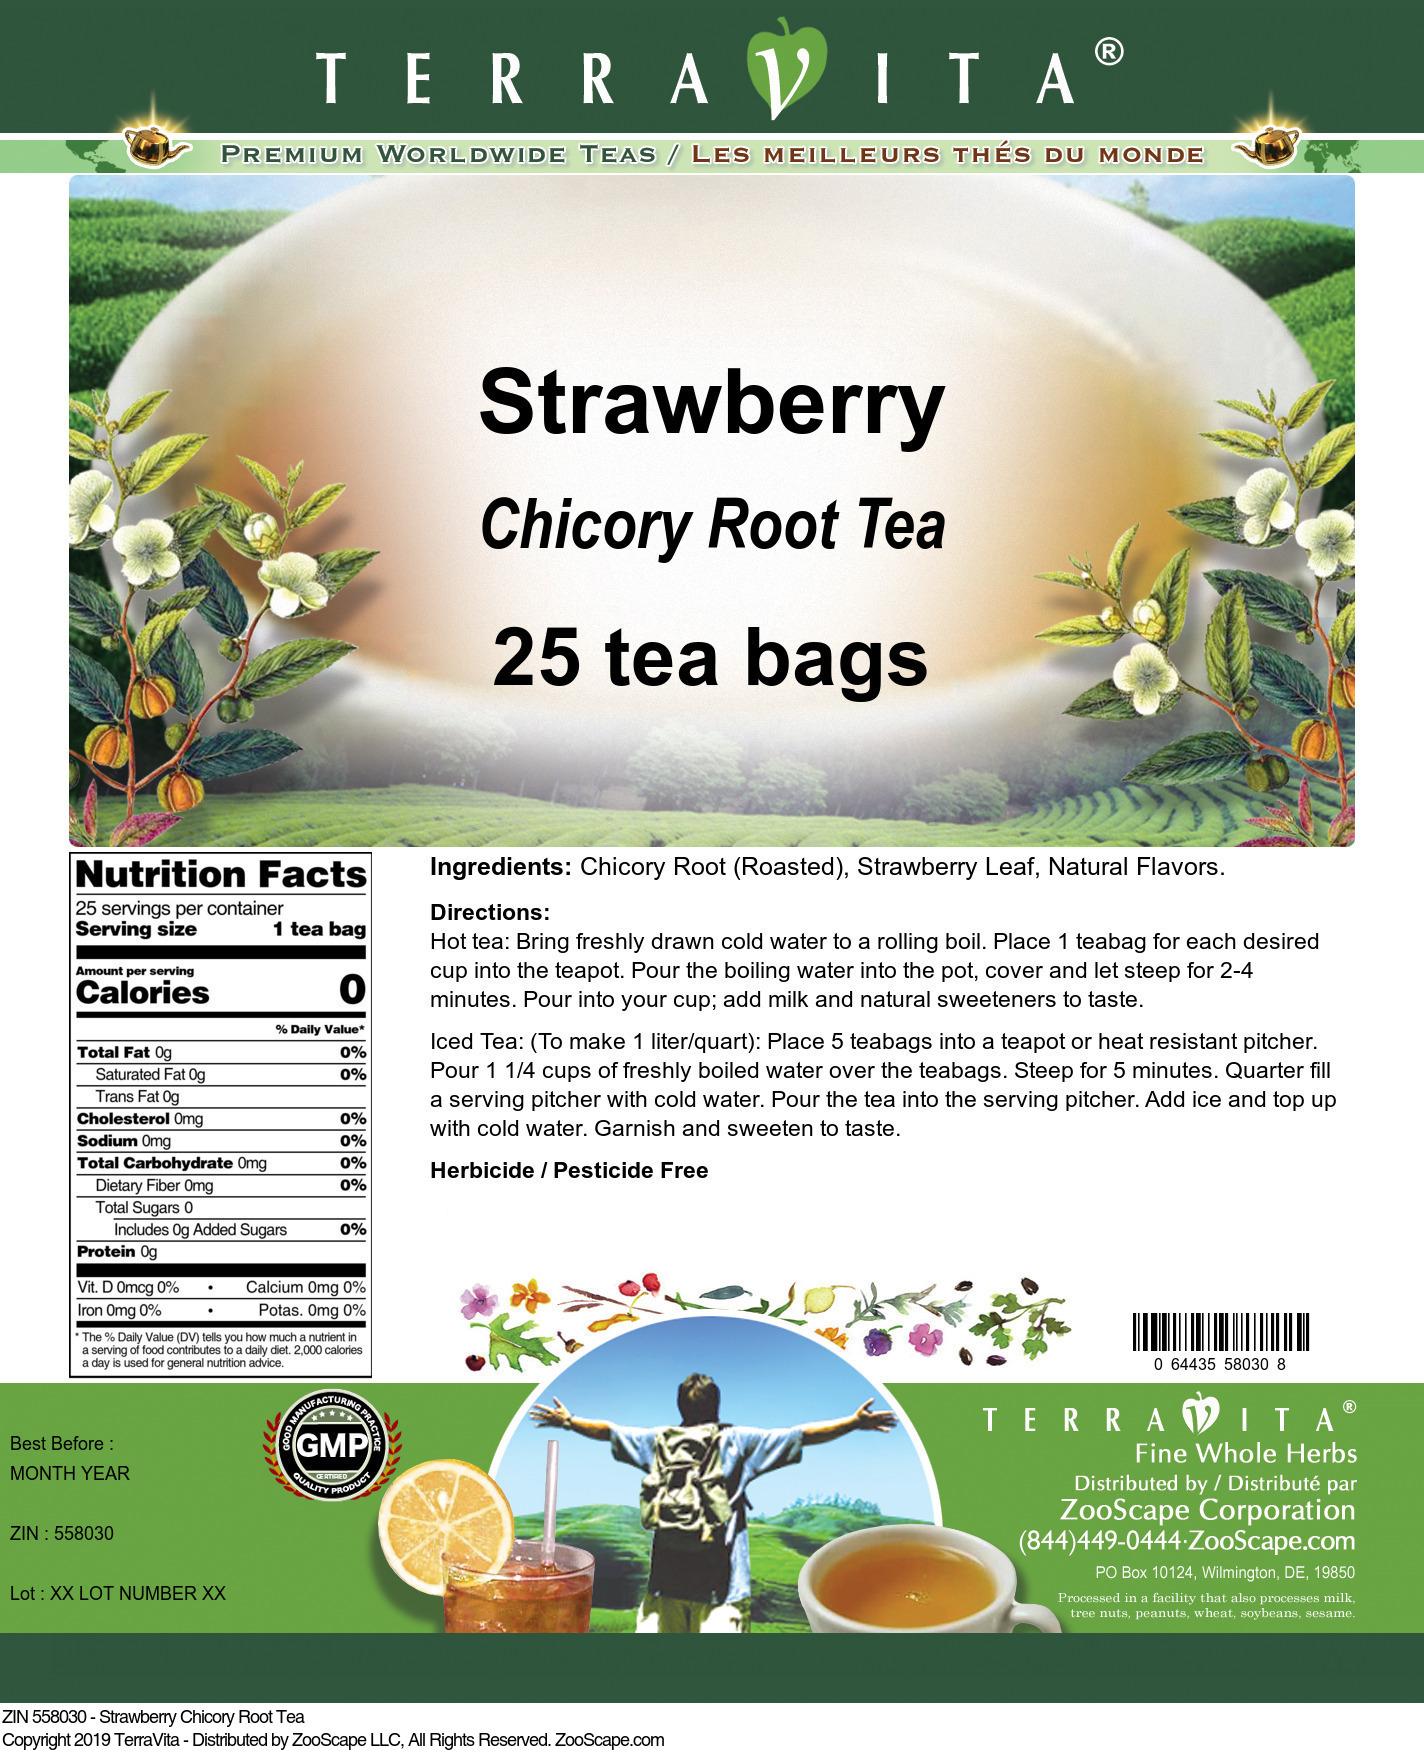 Strawberry Chicory Root Tea